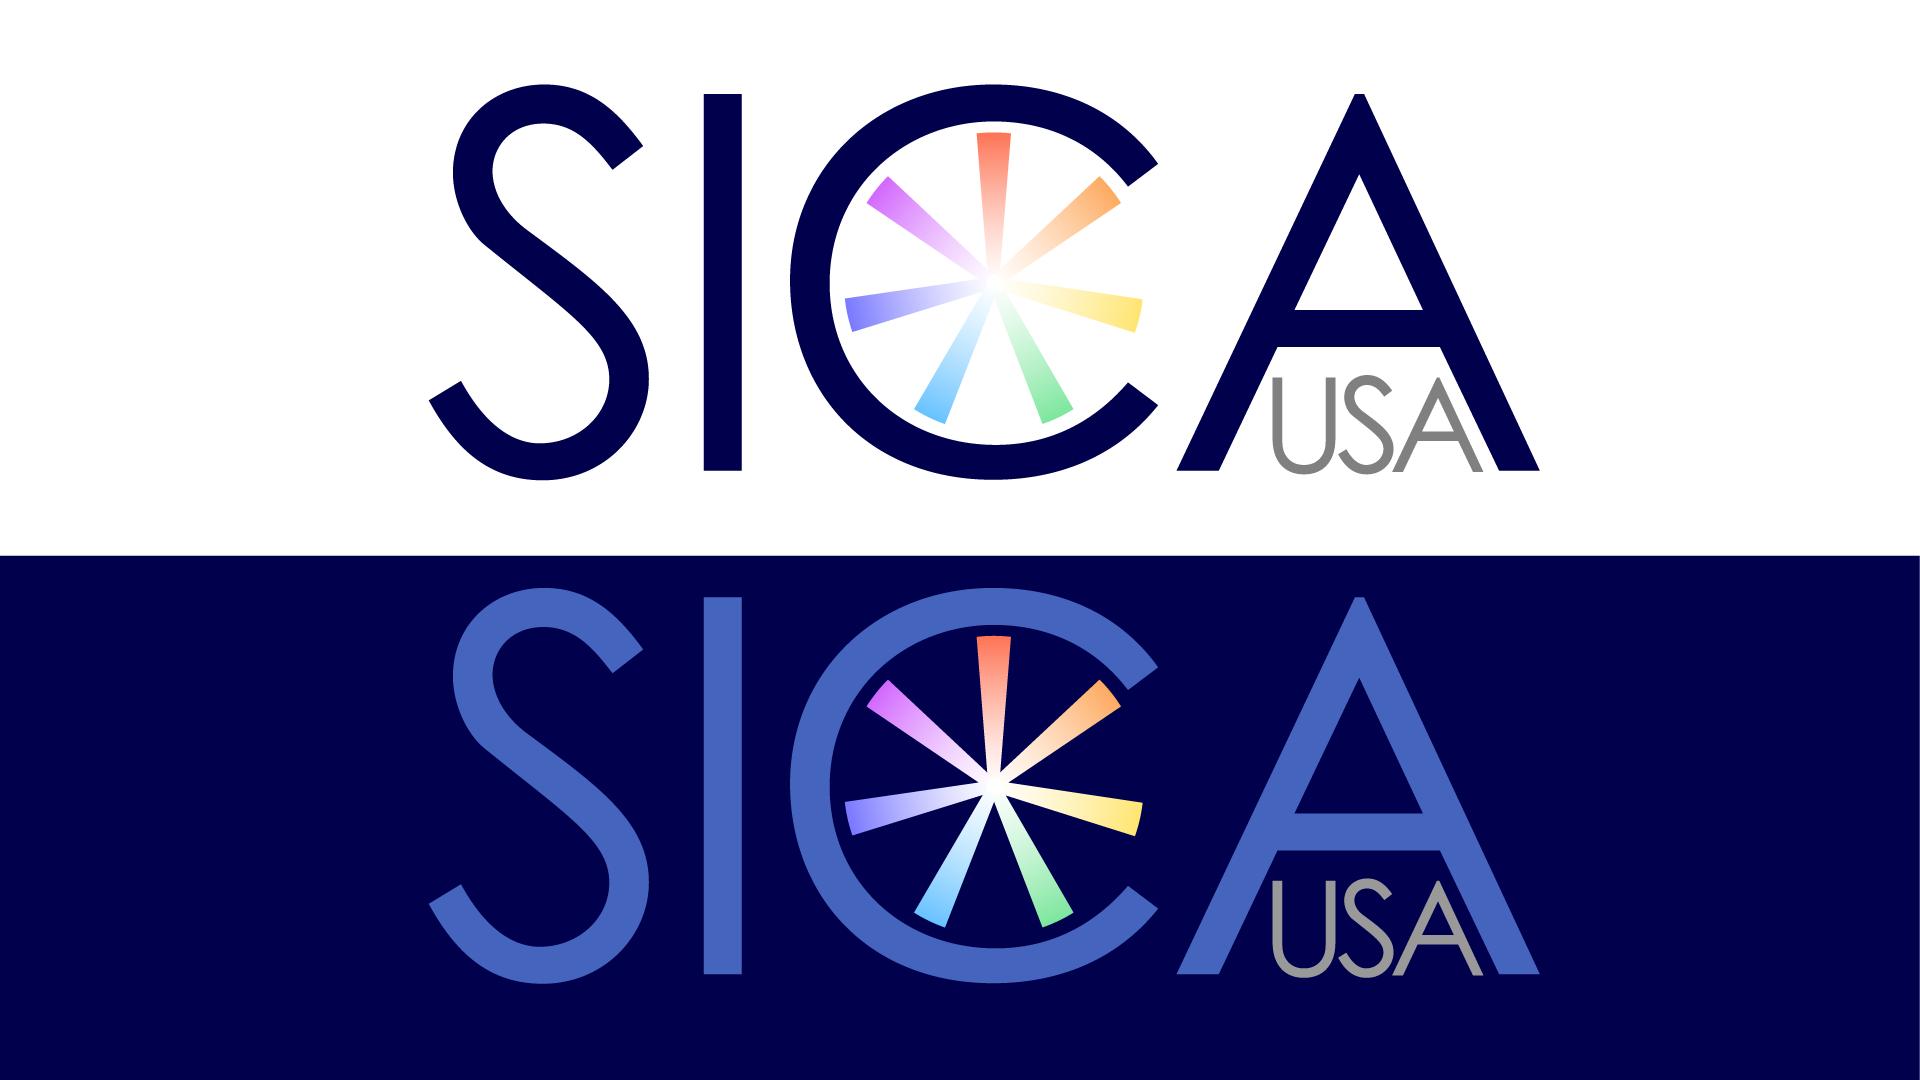 SICA USA